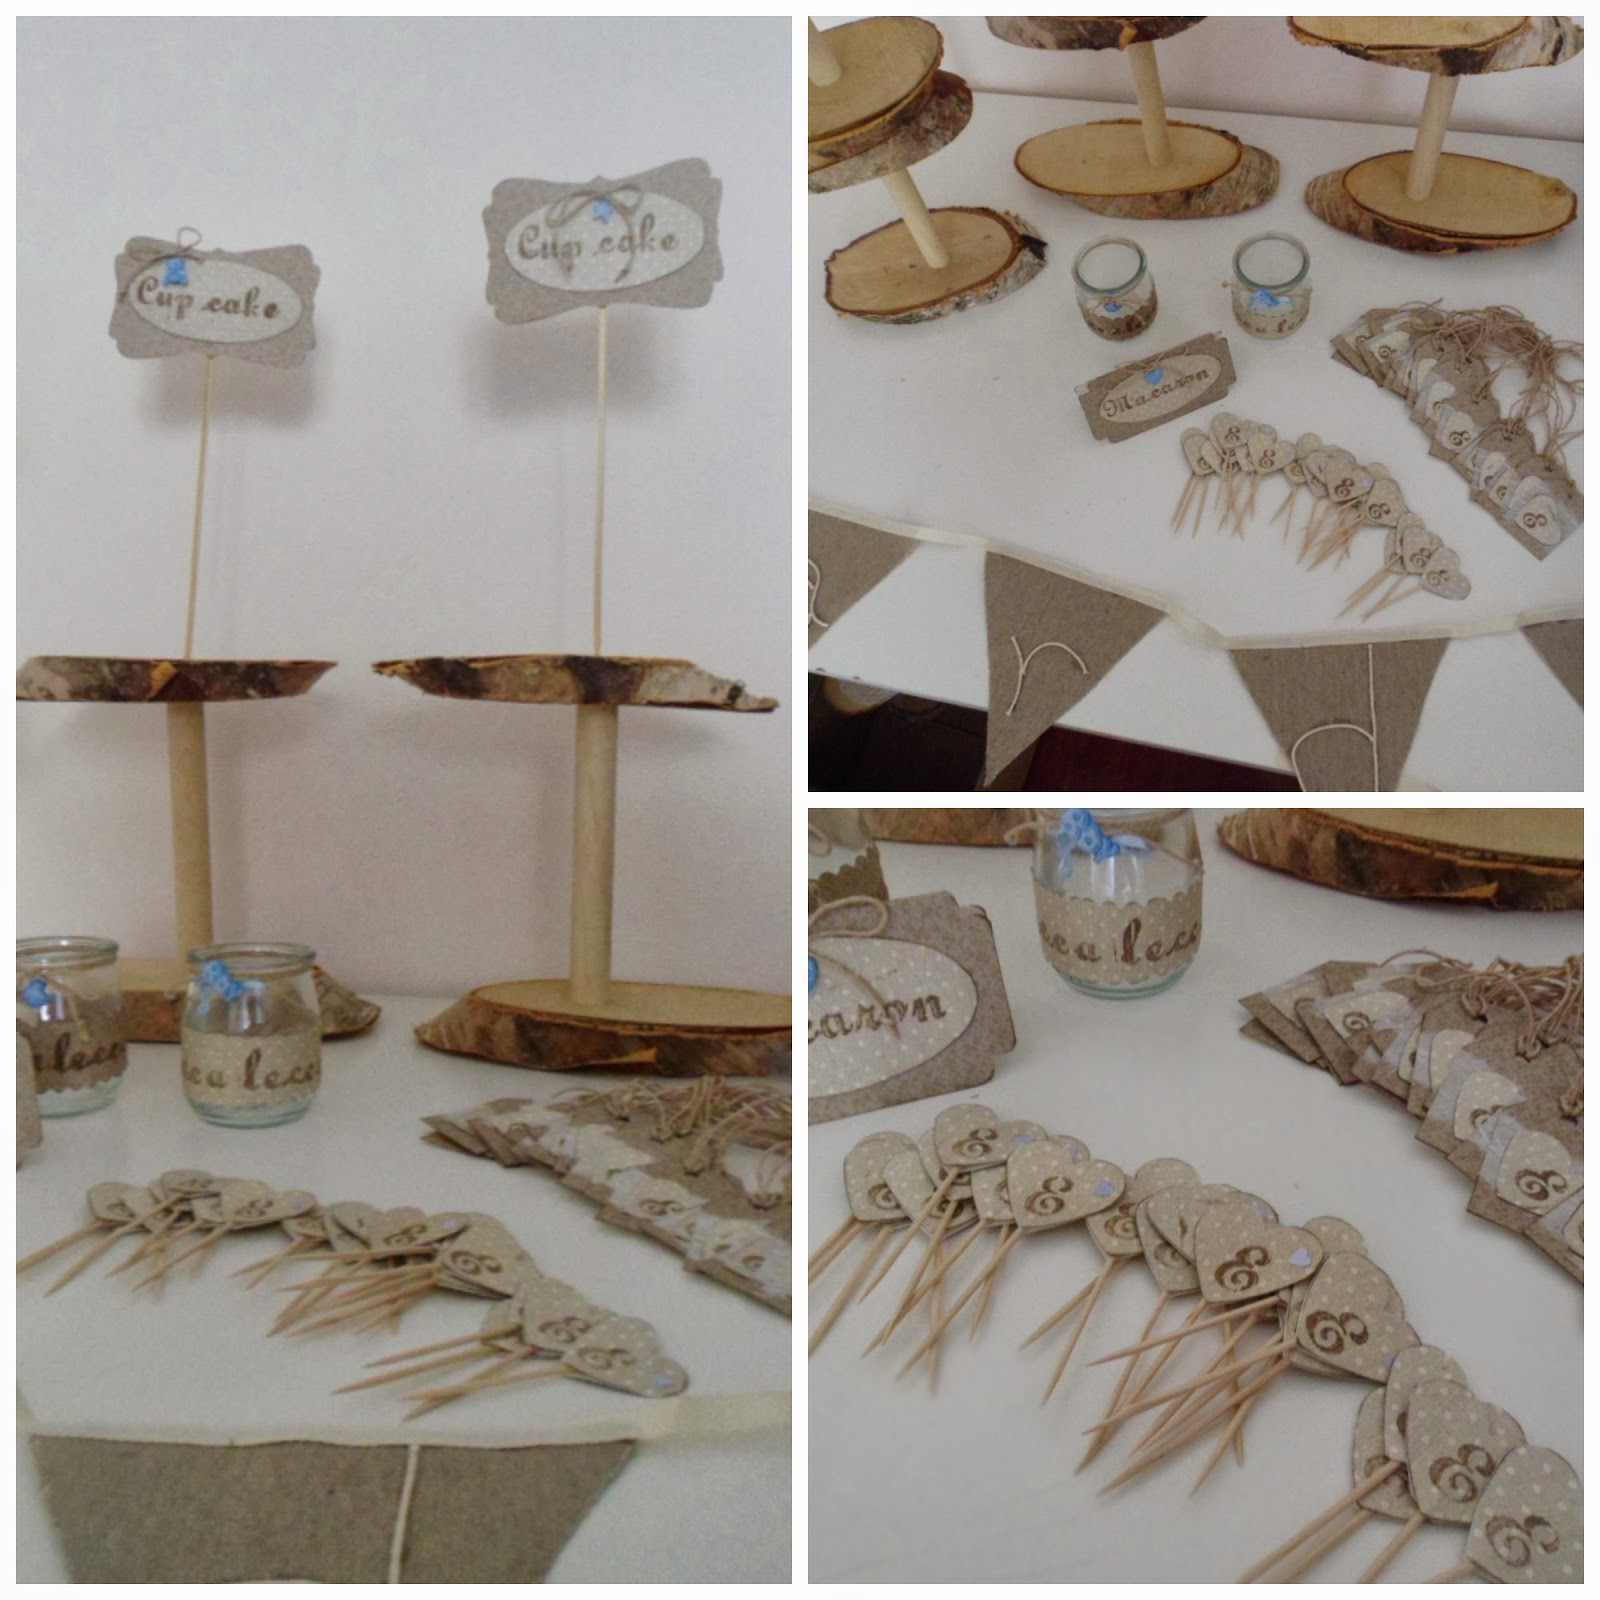 Eli crea shabby & co.: sweet table per un battesimo